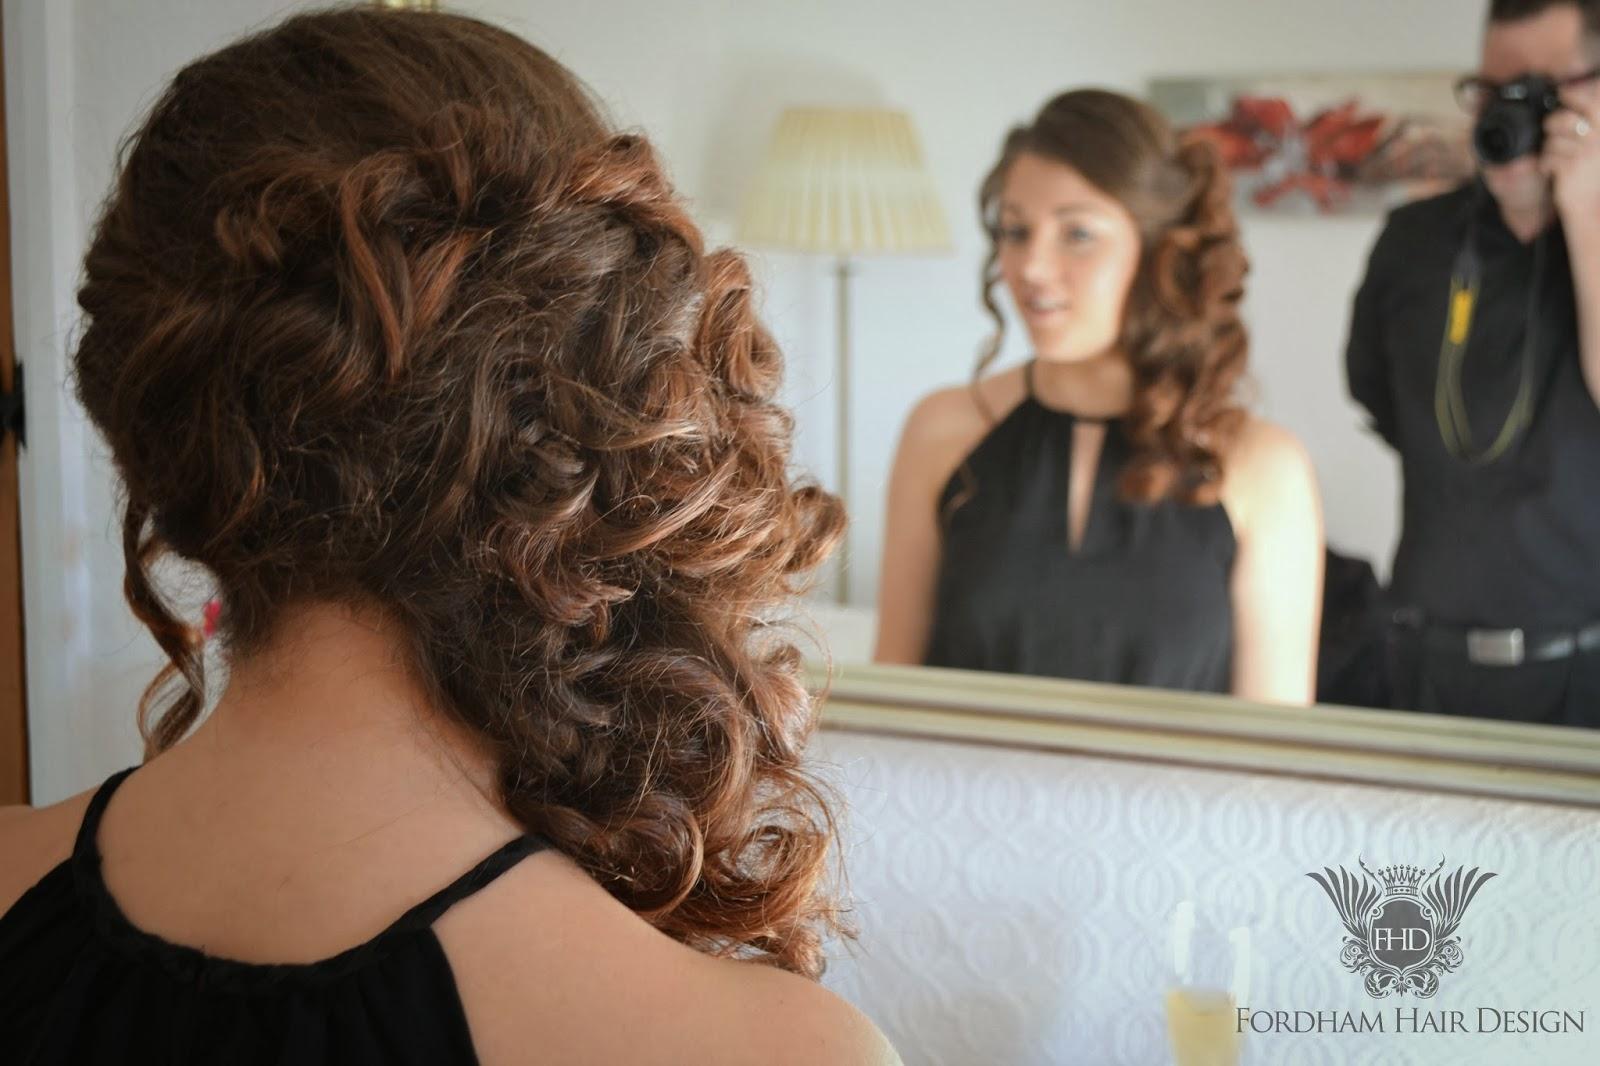 Awe Inspiring Fordham Hair Design Wedding Bridal Hair Specialist Wedding Hairstyles For Women Draintrainus